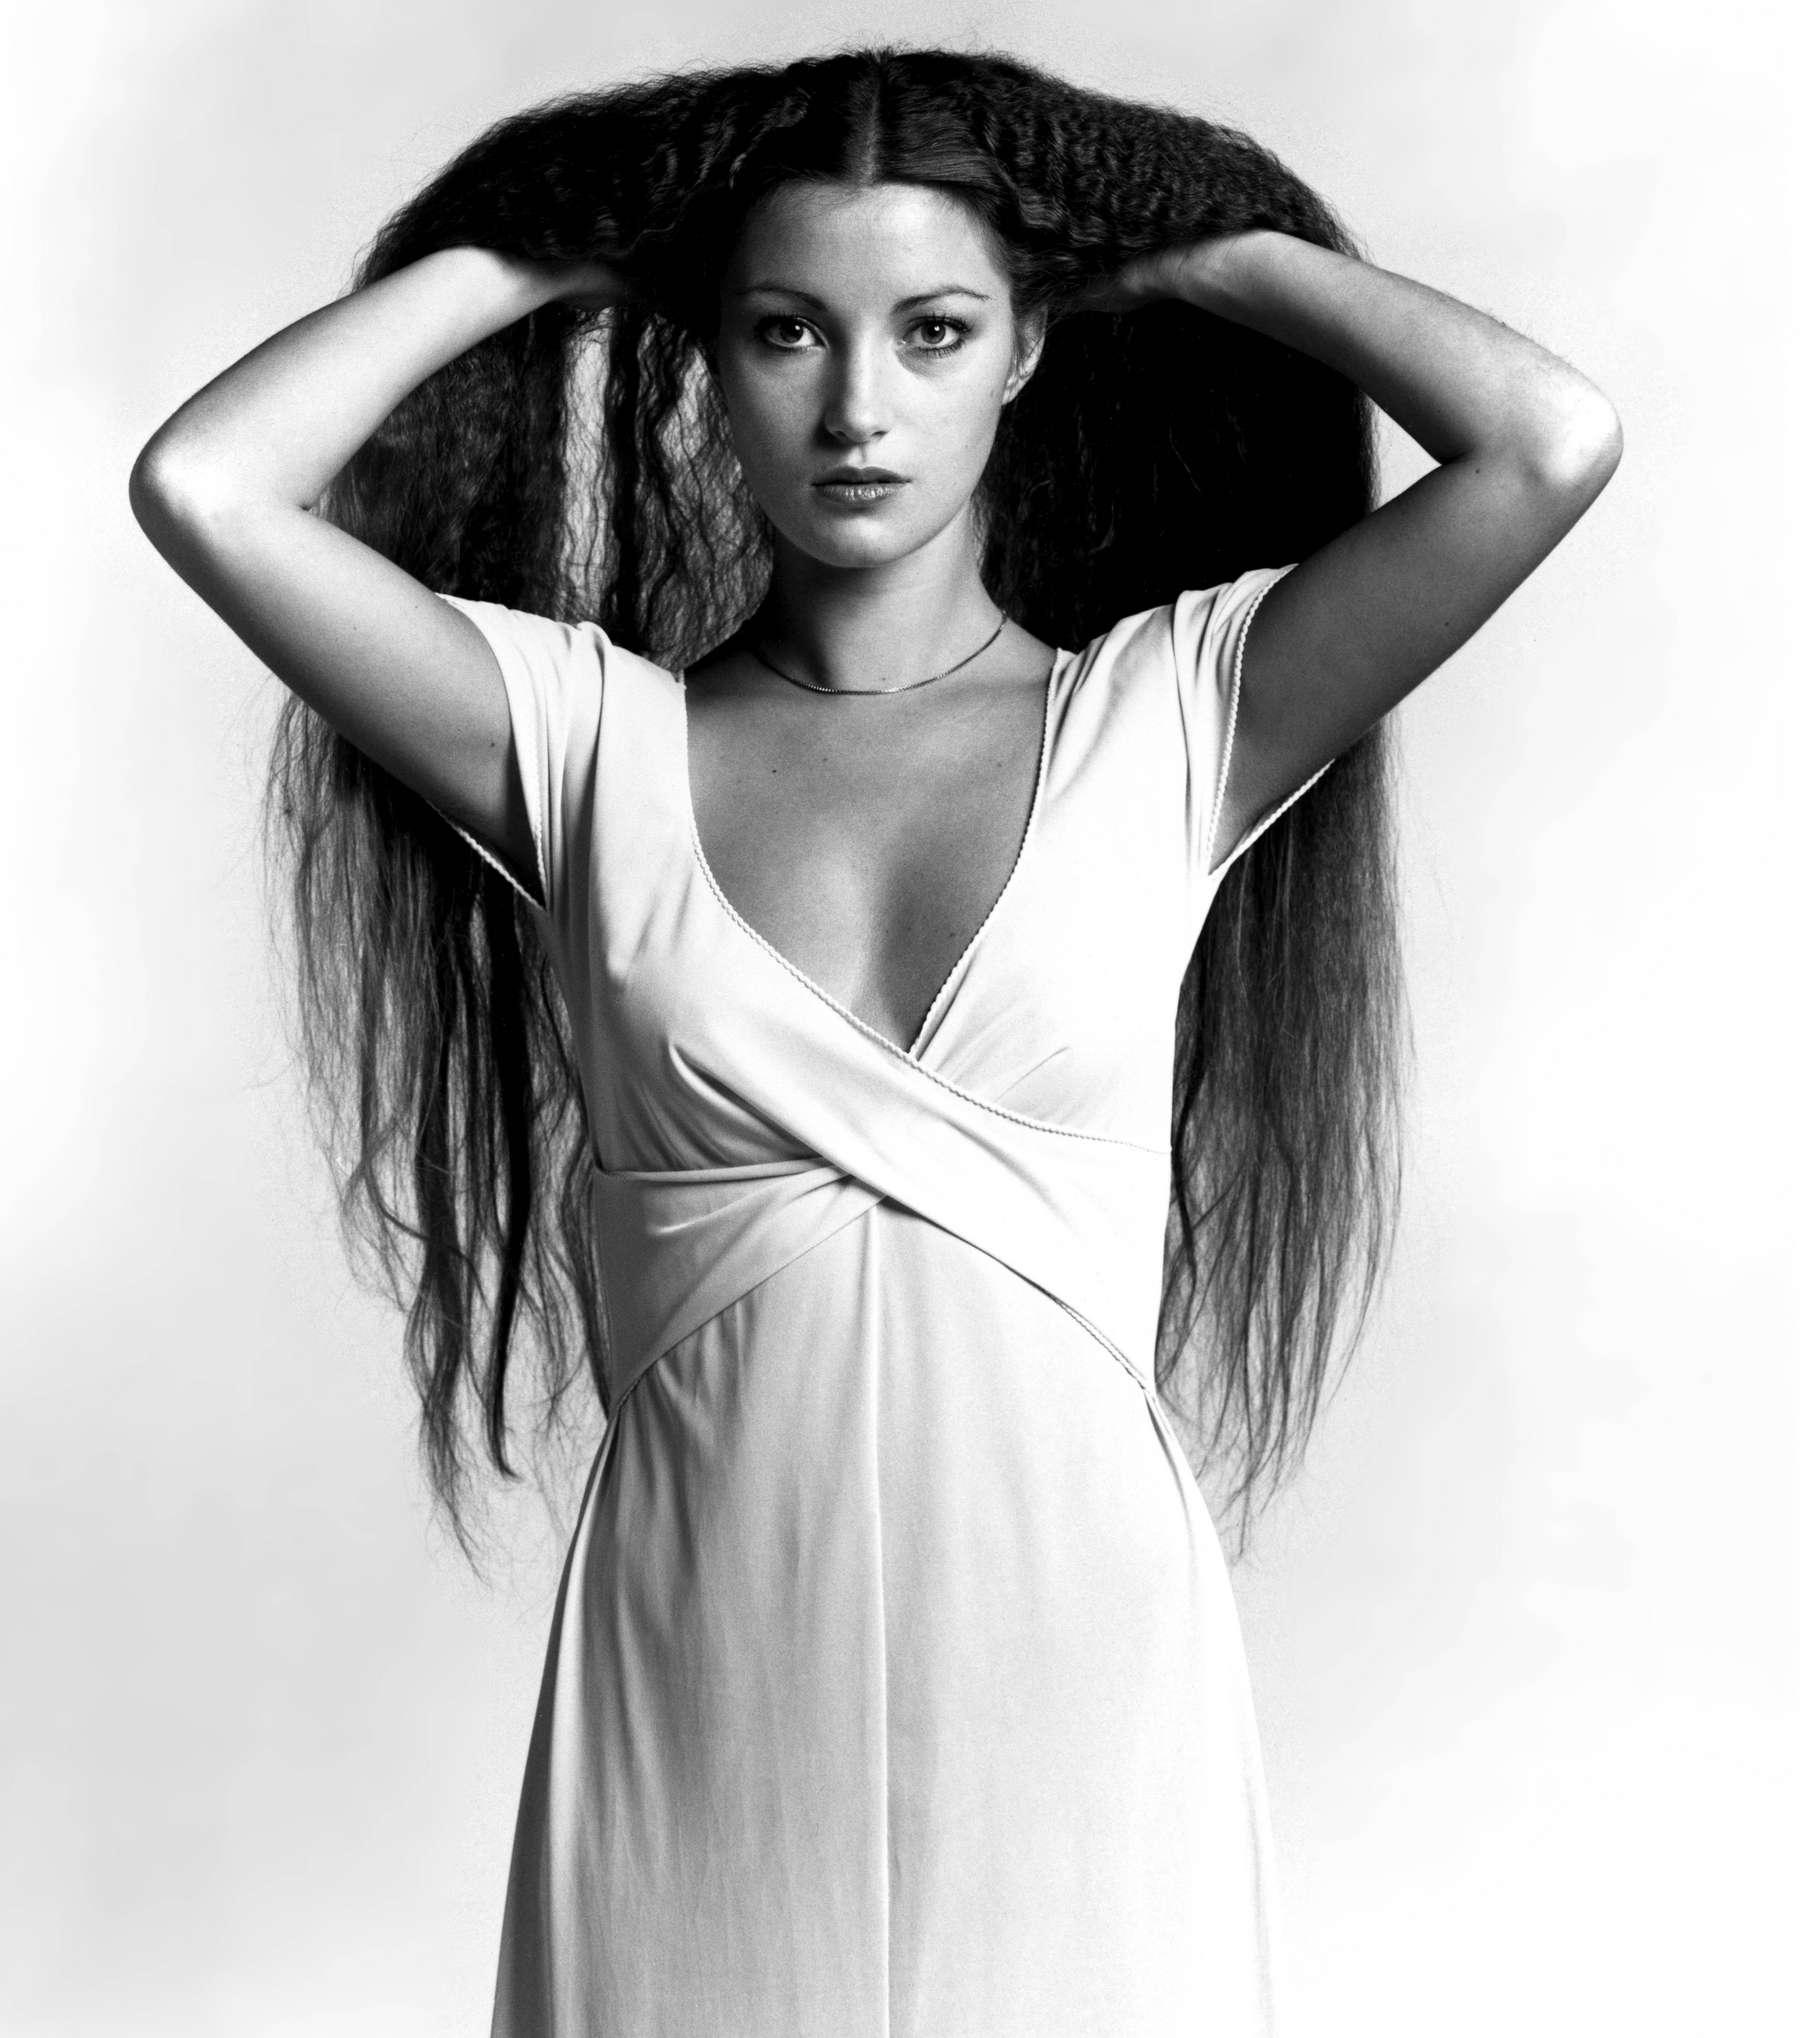 Jane Seymour hot Photoshoot-06 - GotCeleb